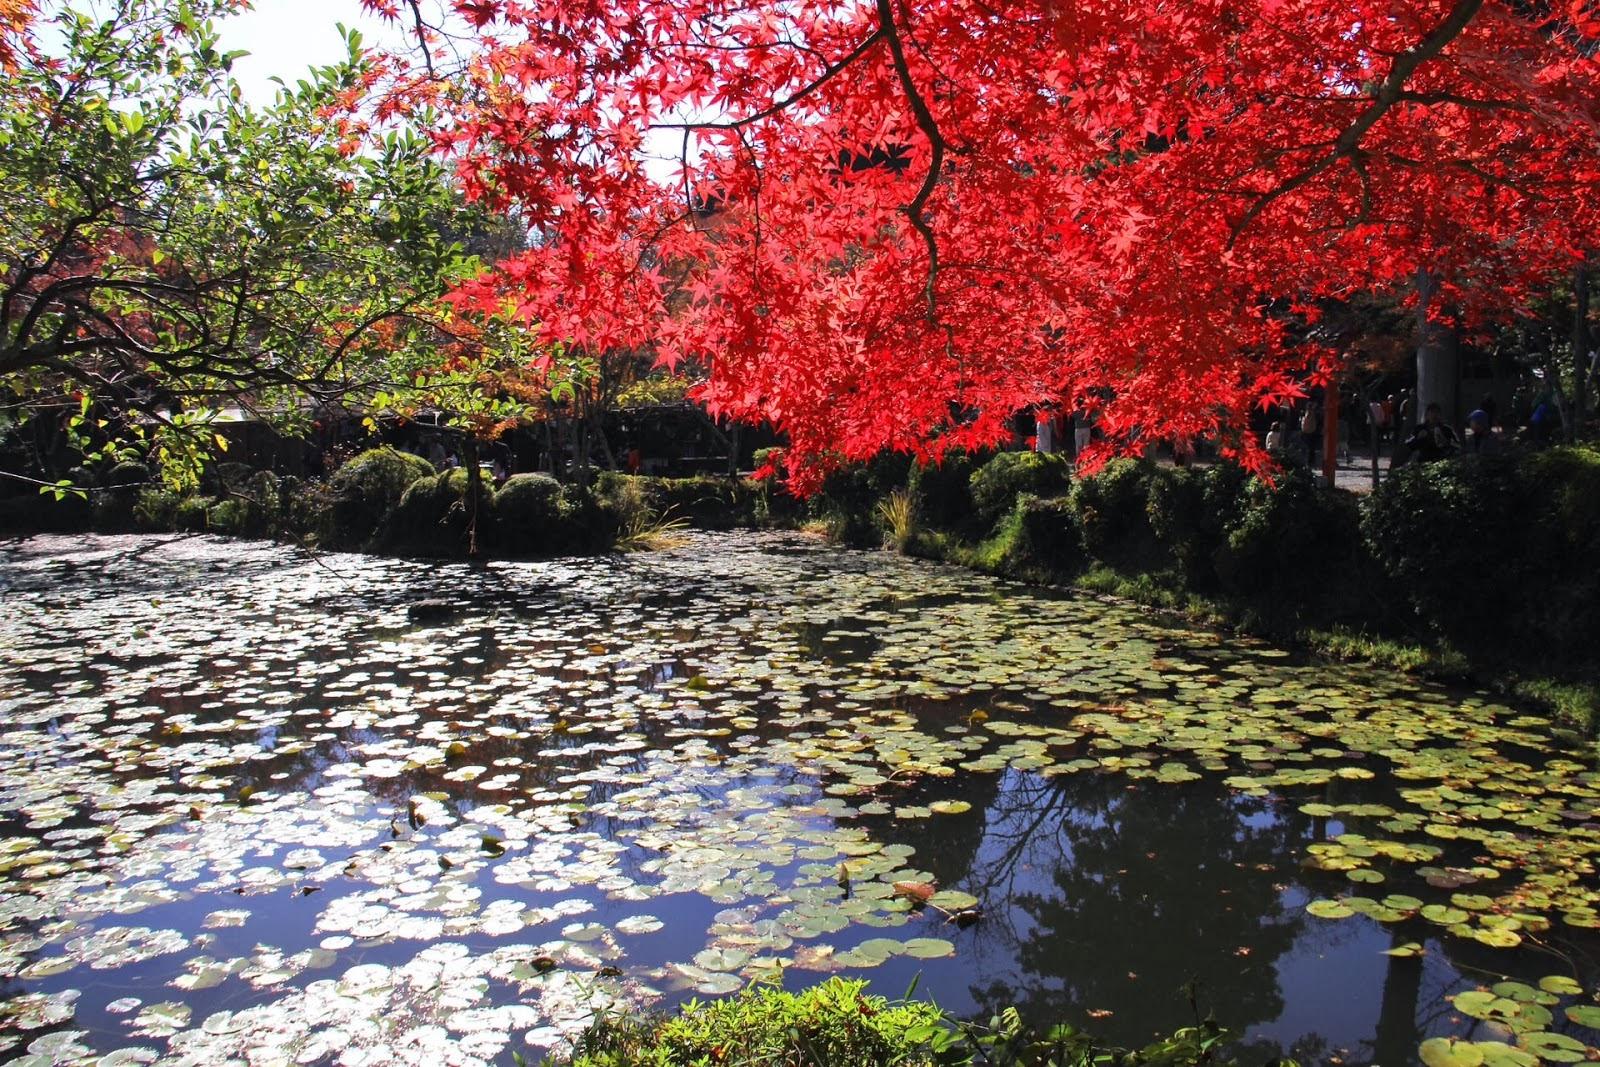 Paisajes Impresionantes De La Naturaleza: Farandula Digital ├: Imagenes Impresionantes De La